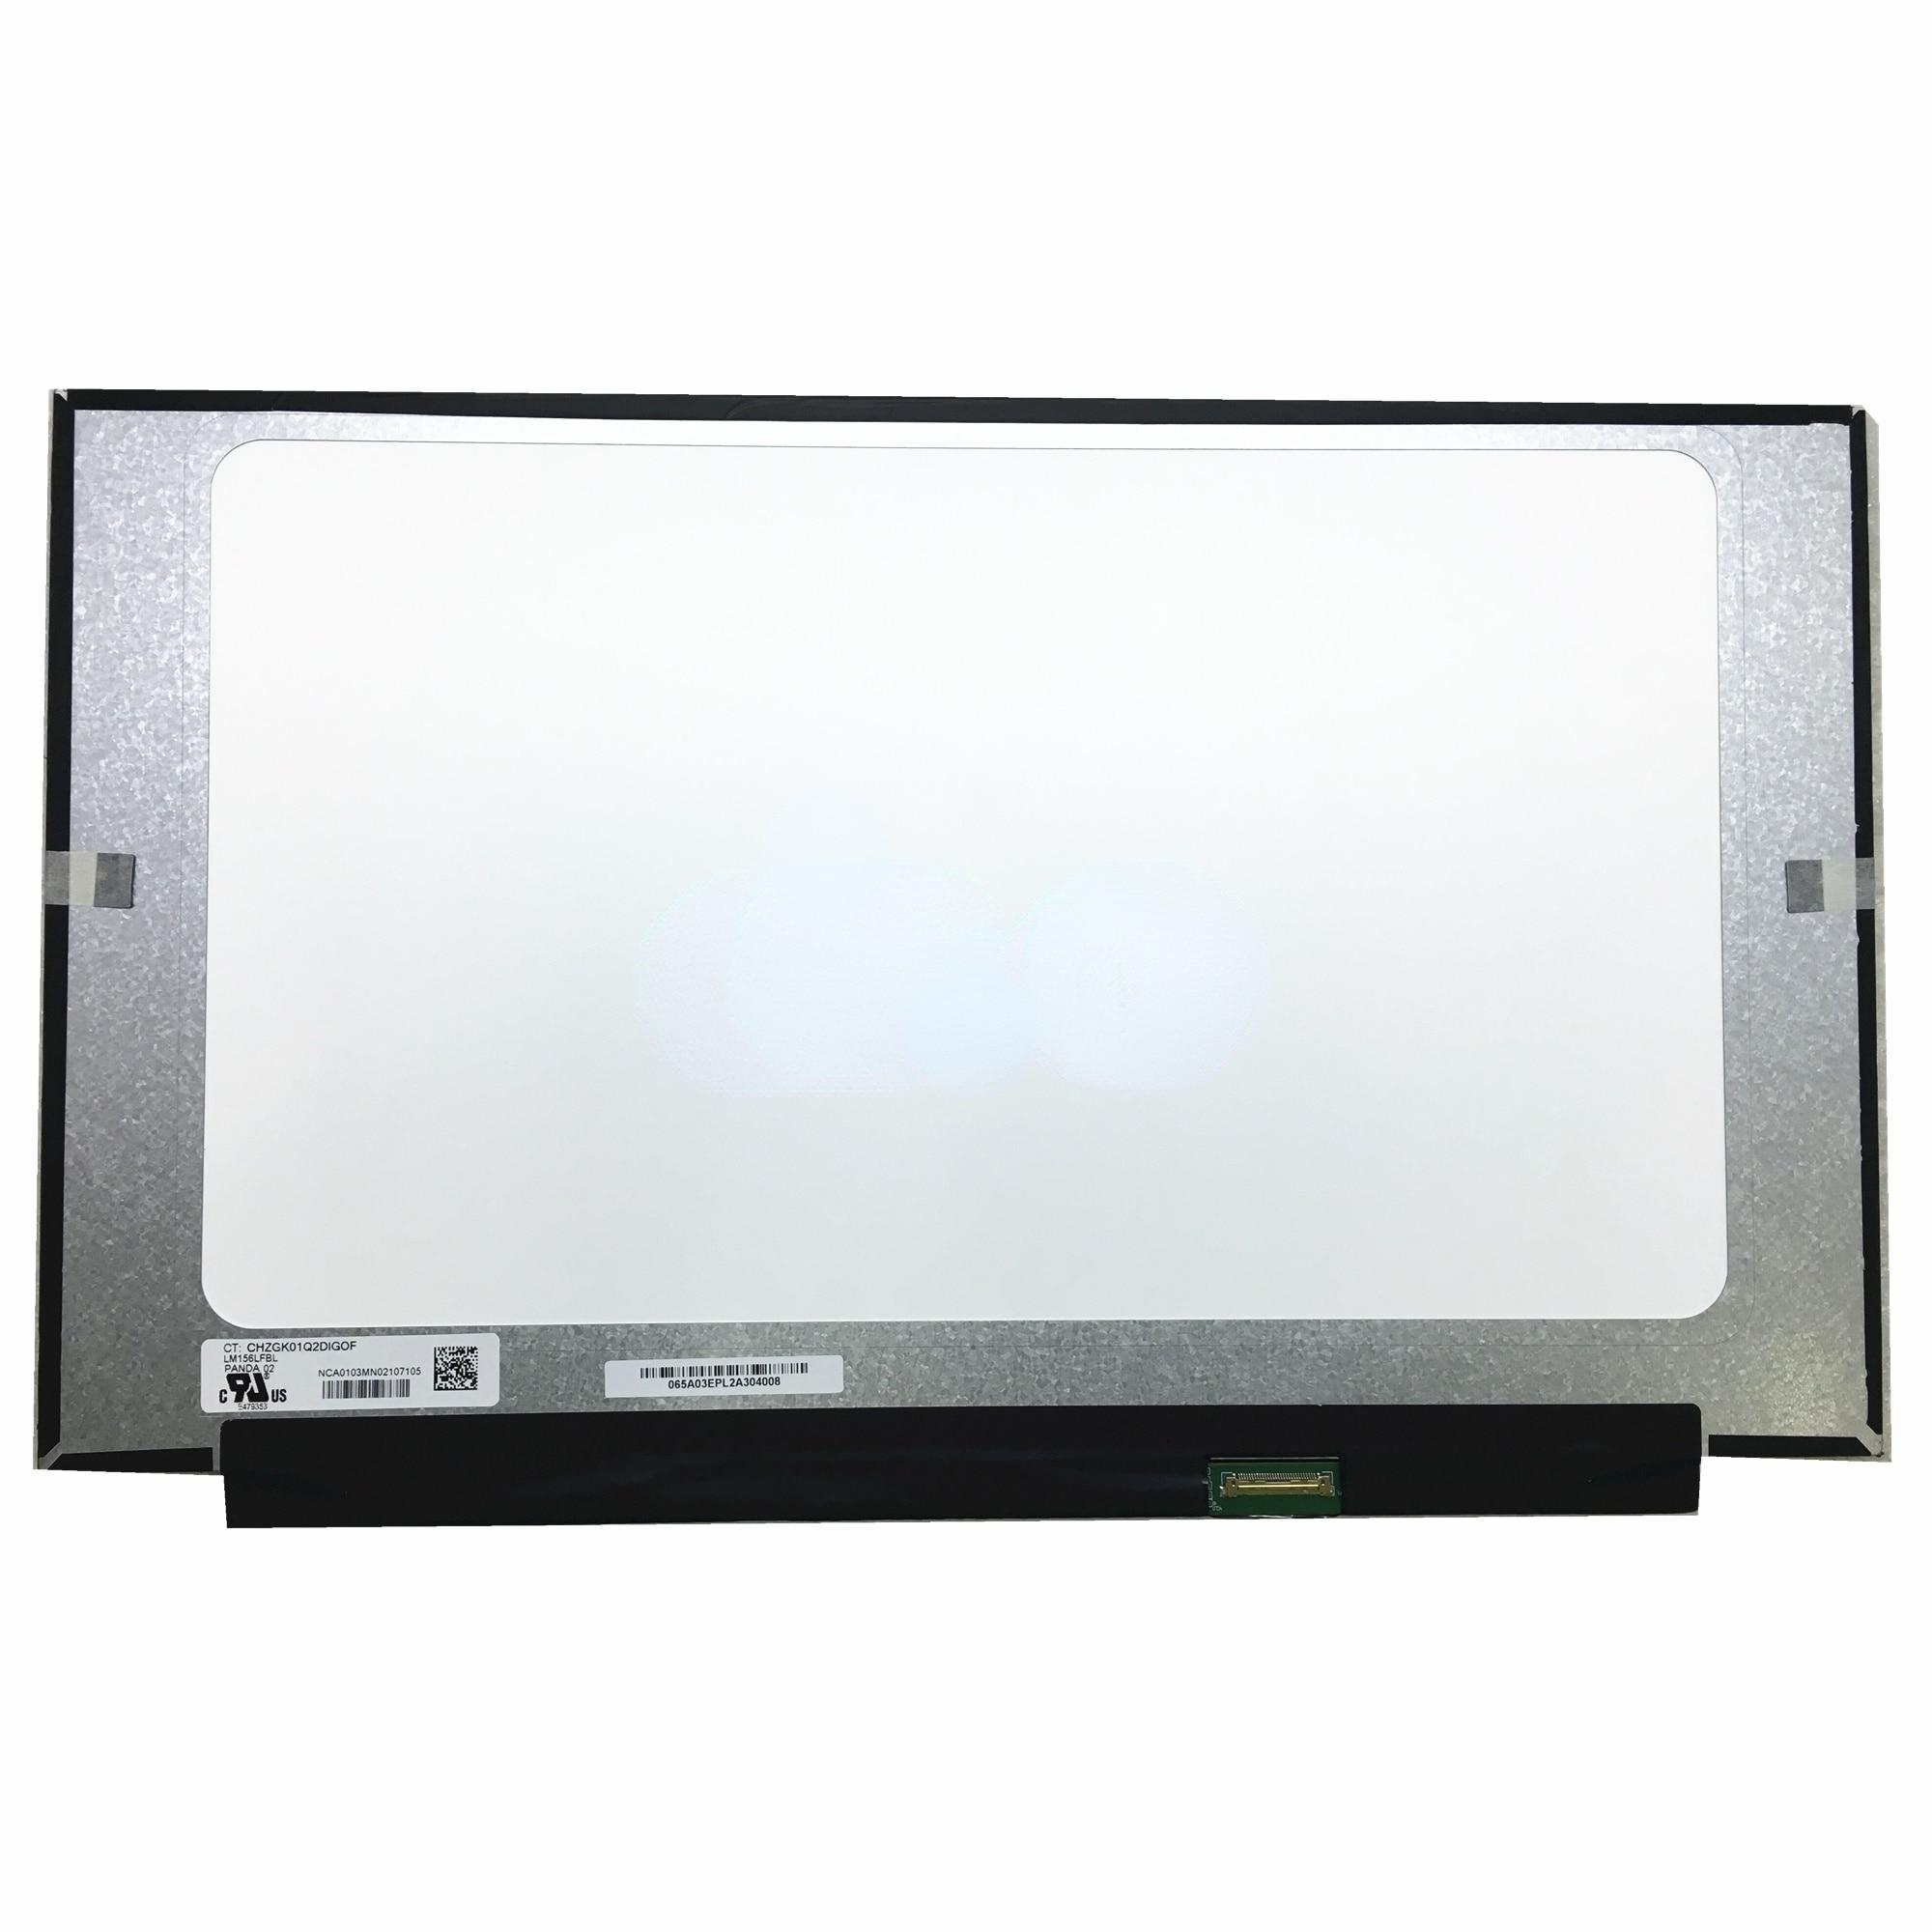 LM156LFBL02 LM156LFBL01 LM156LFBL03 15.6 ''IPS الكمبيوتر المحمول LCD شاشة LED استبدال 1920*1080 EDP 30 دبابيس